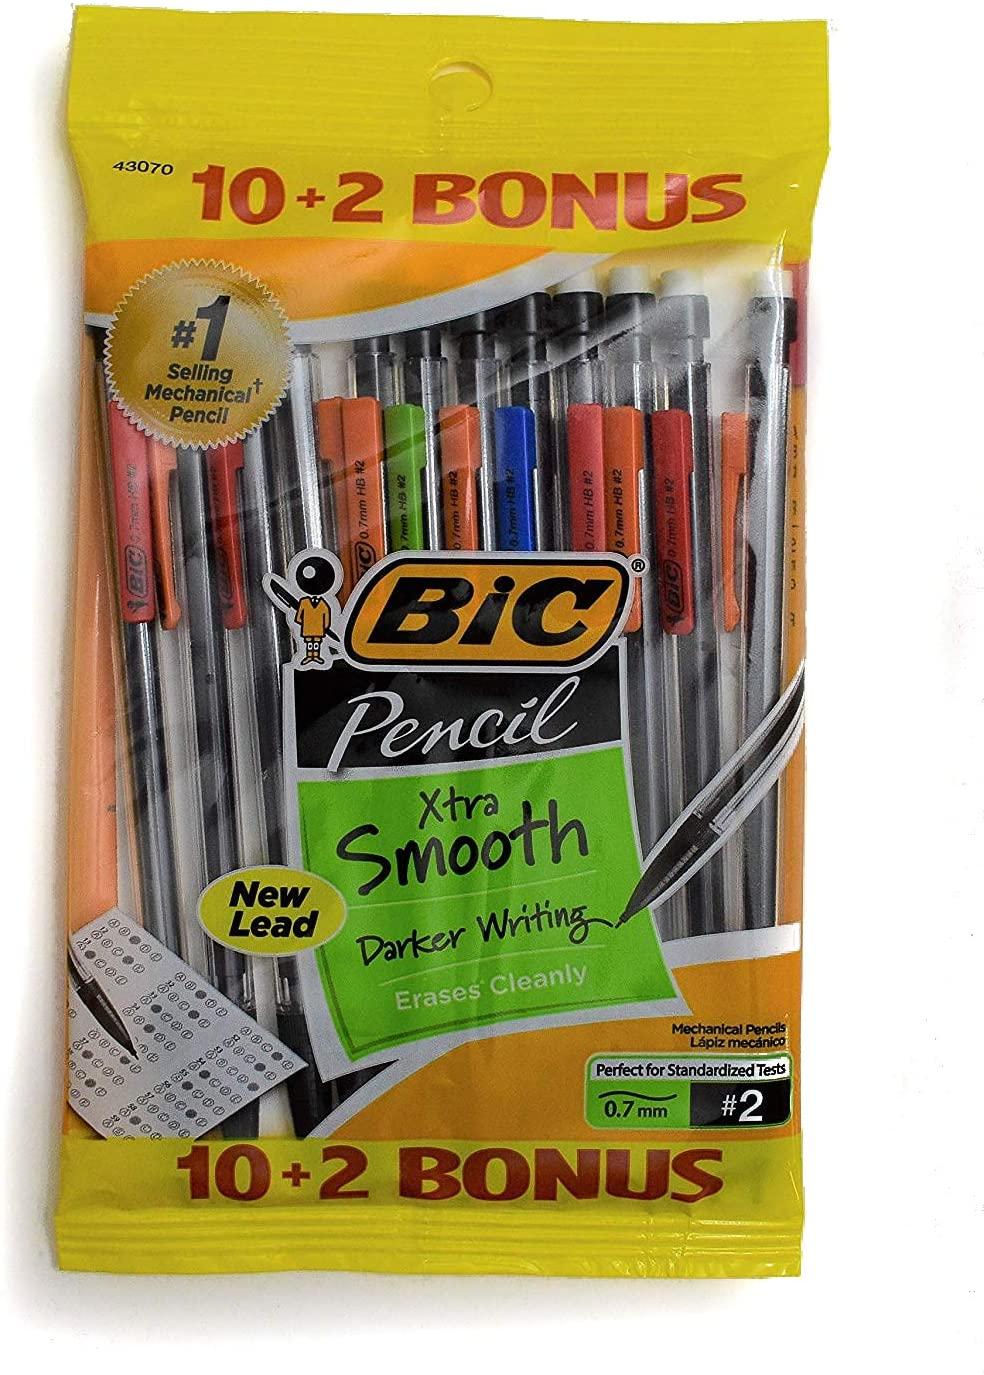 BIC Pencil Xtra Life, Medium Point (0.7mm), 12 Count